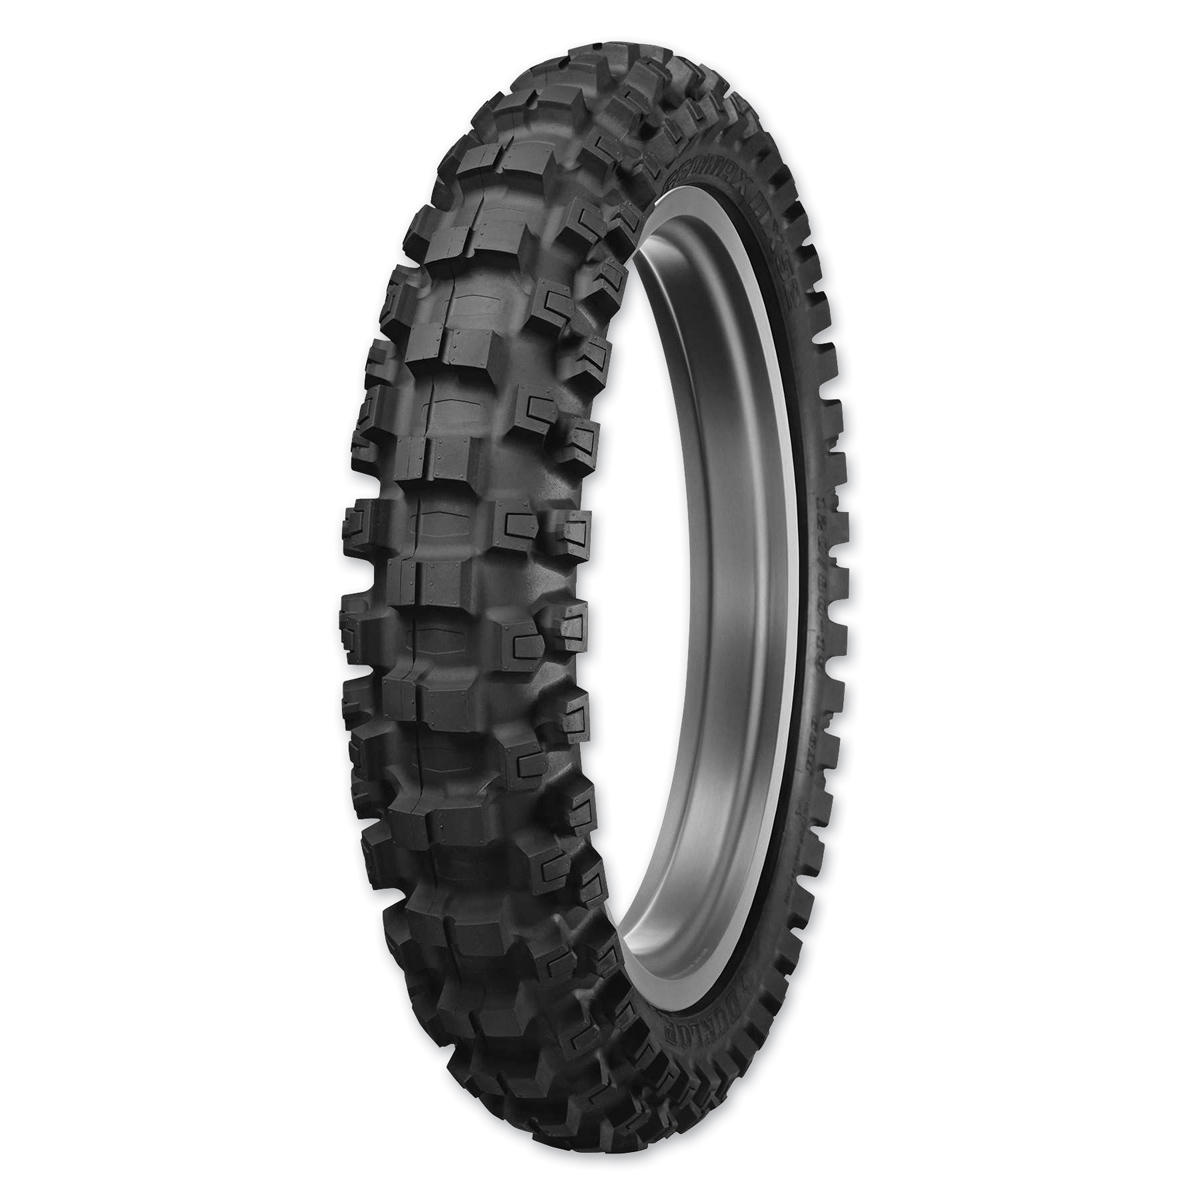 Dunlop MX52 90/100-14 I/T-H/T Rear Tire